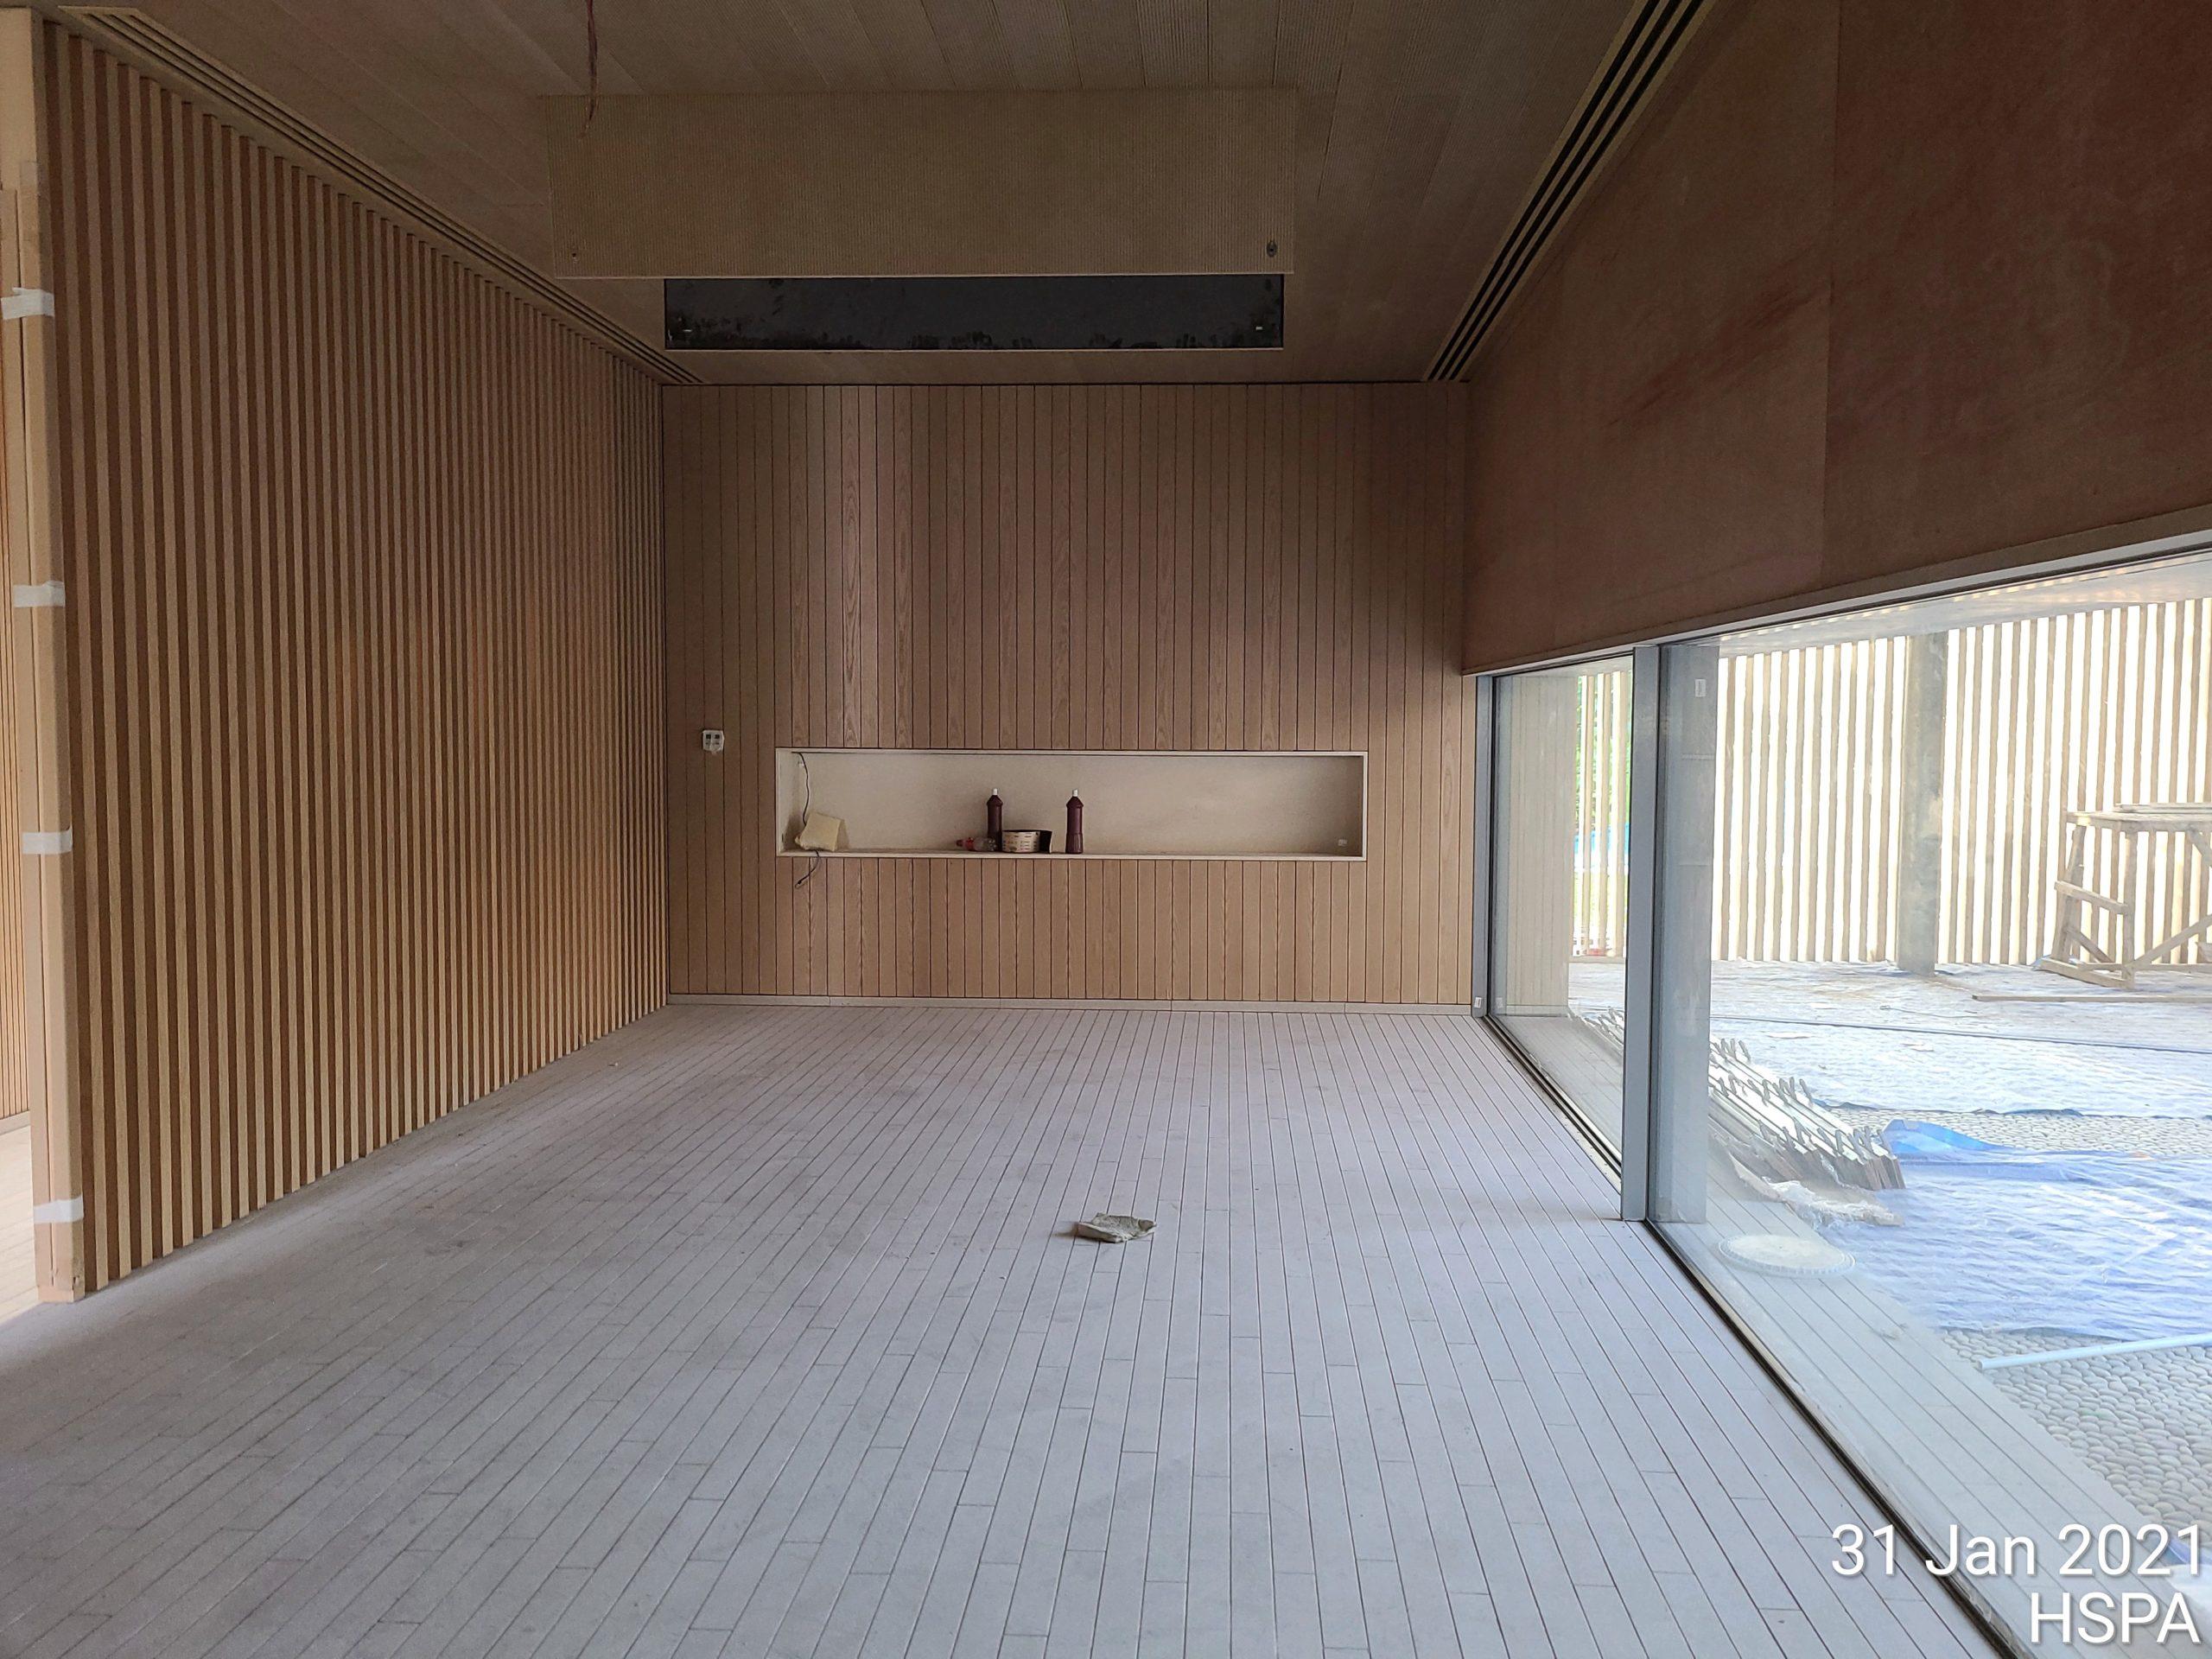 https://replan.com.sg/wp-content/uploads/2021/03/HSPA-Tiles-4-scaled.jpg